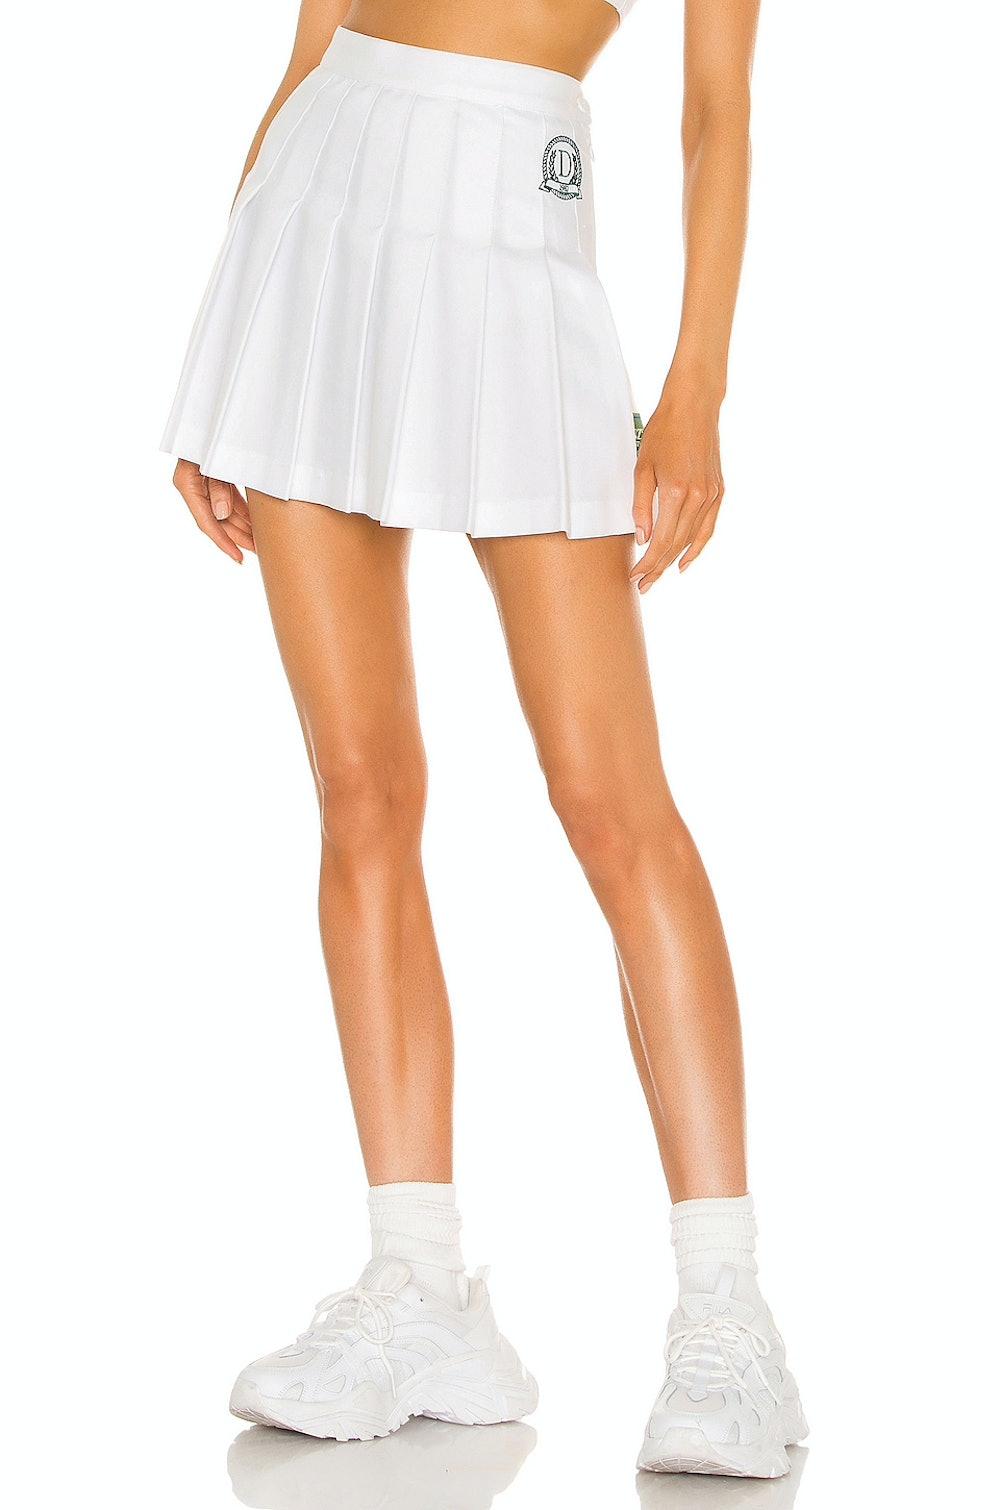 Danzy x REVOLVE Tennis Skirt